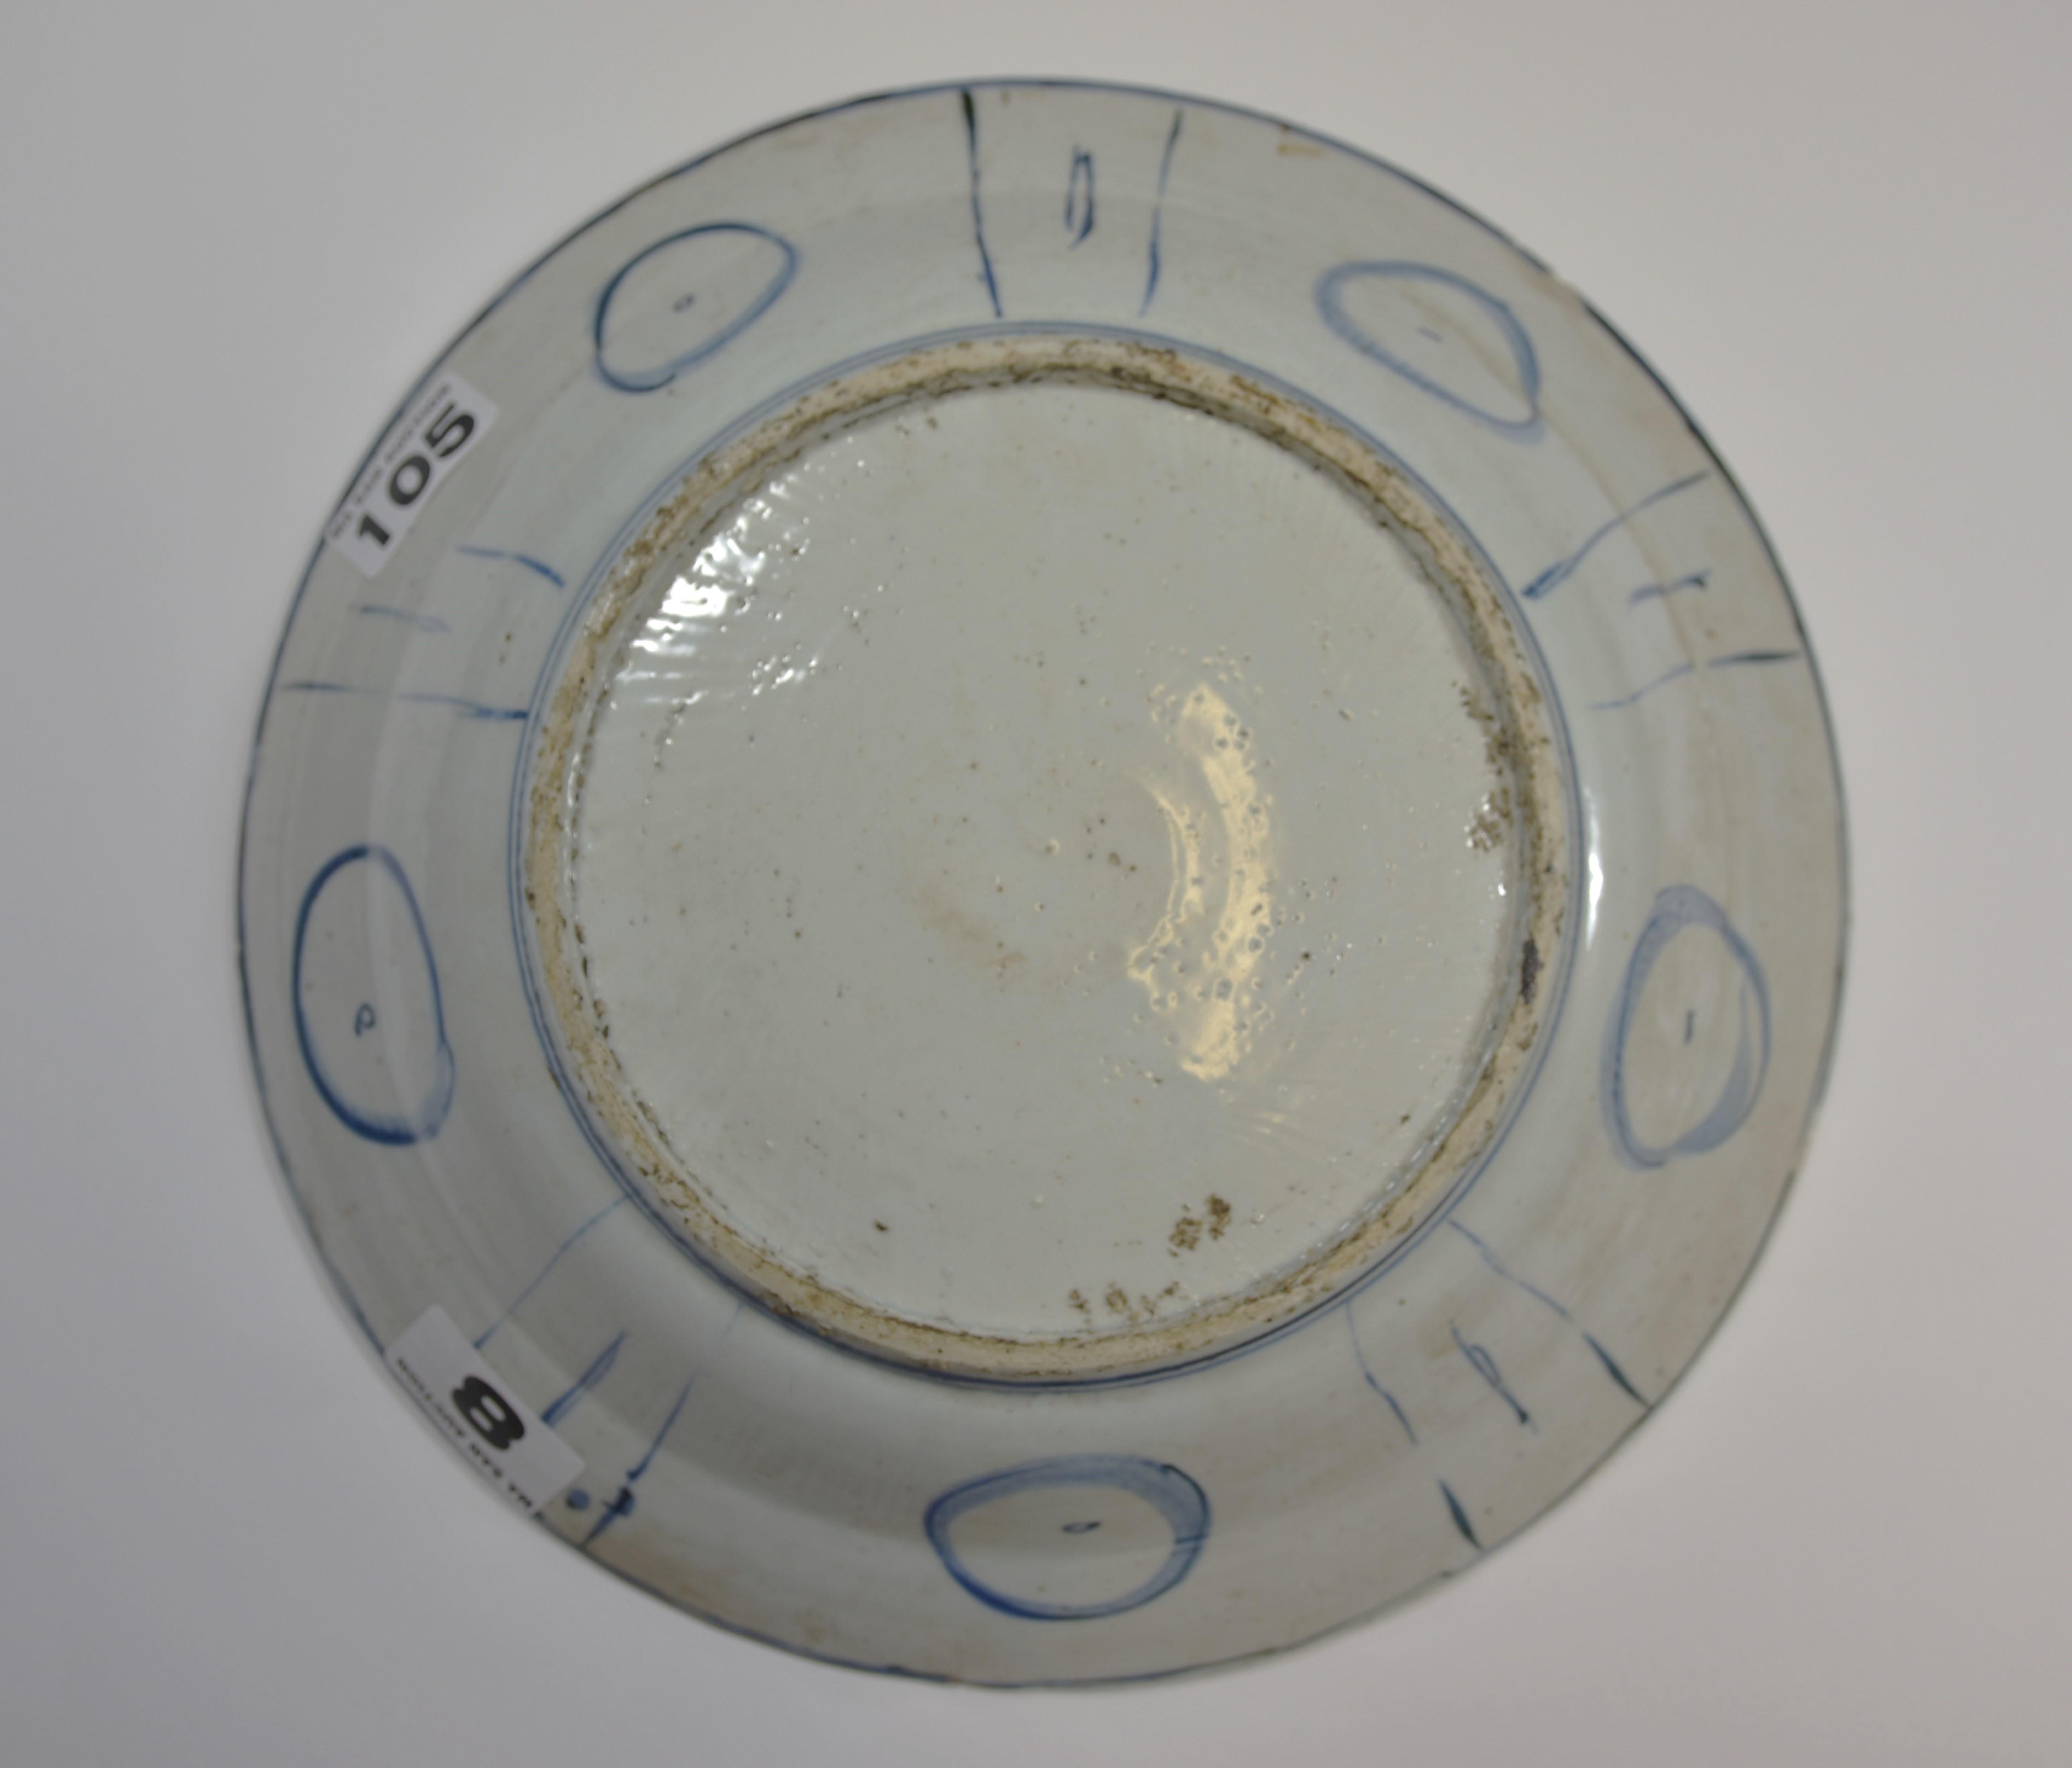 Lot 5 - A 17th Ming dynasty blue and white Kraak dish 35cm diameter明 十七世紀 青花花鳥大碟